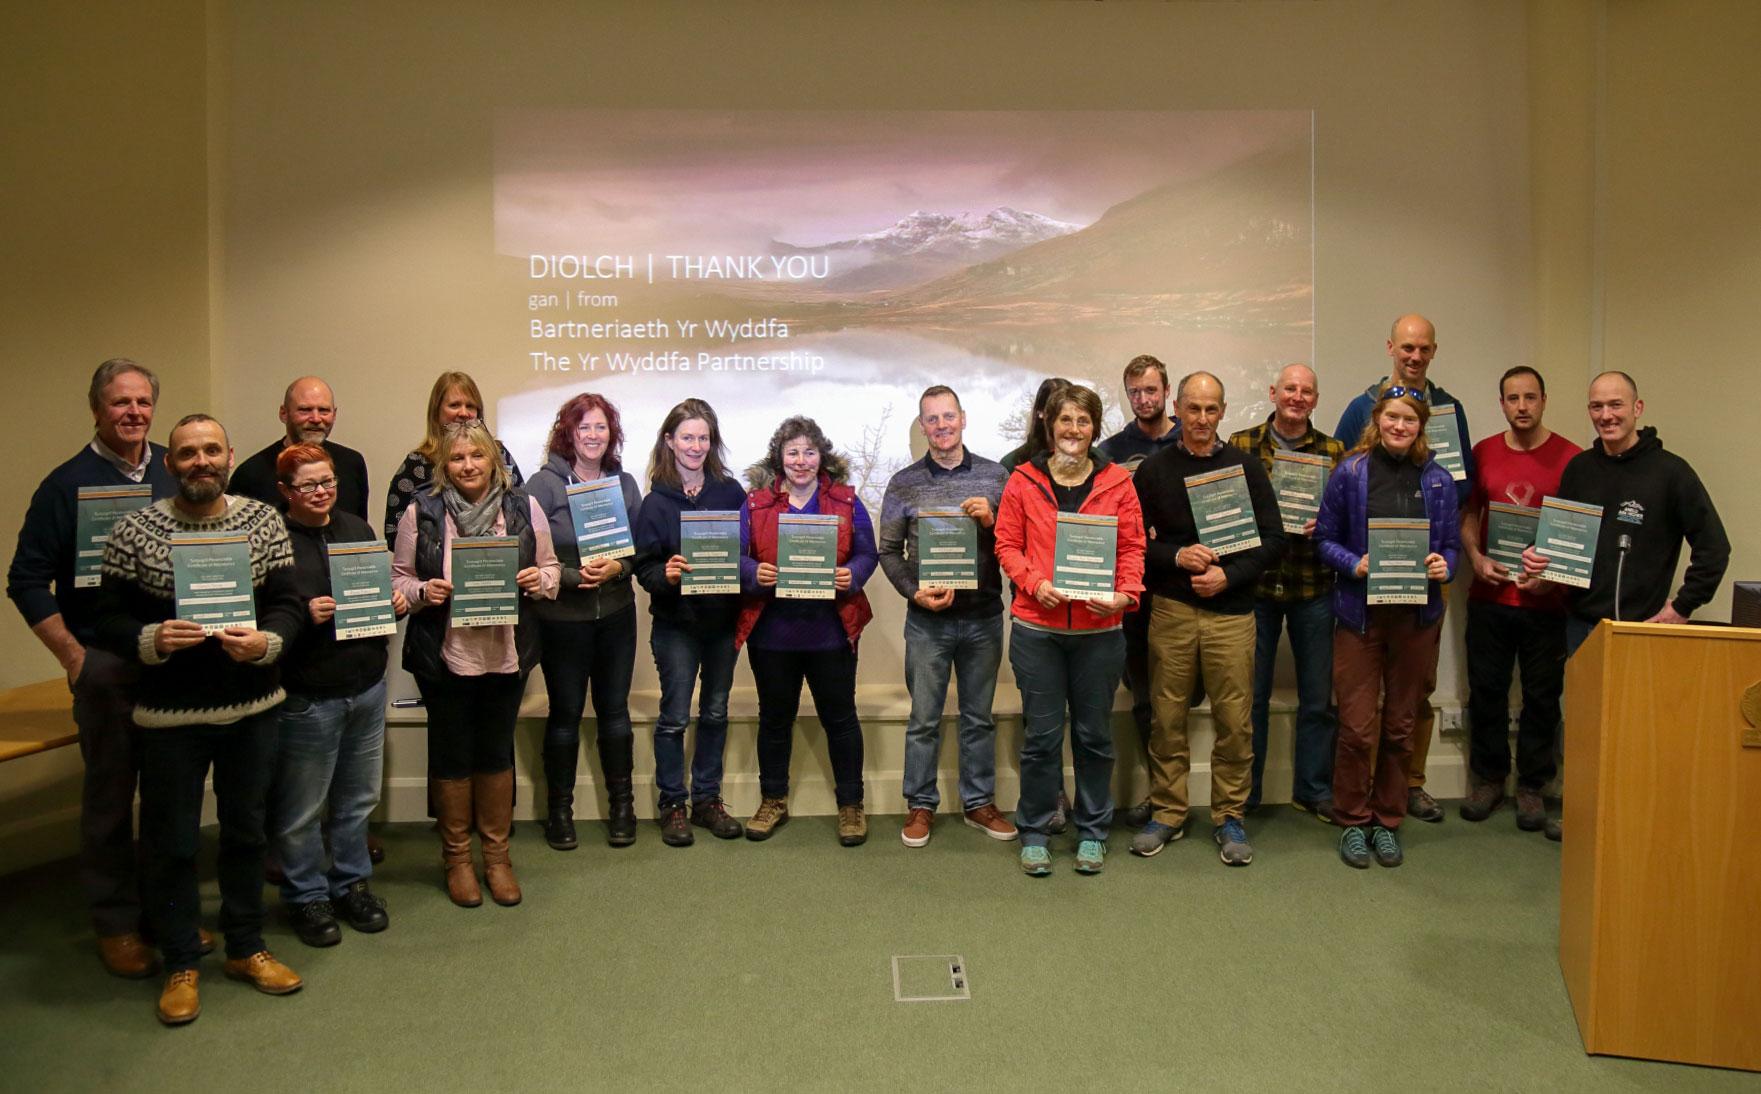 Snowdonia Ambassadors with certificates